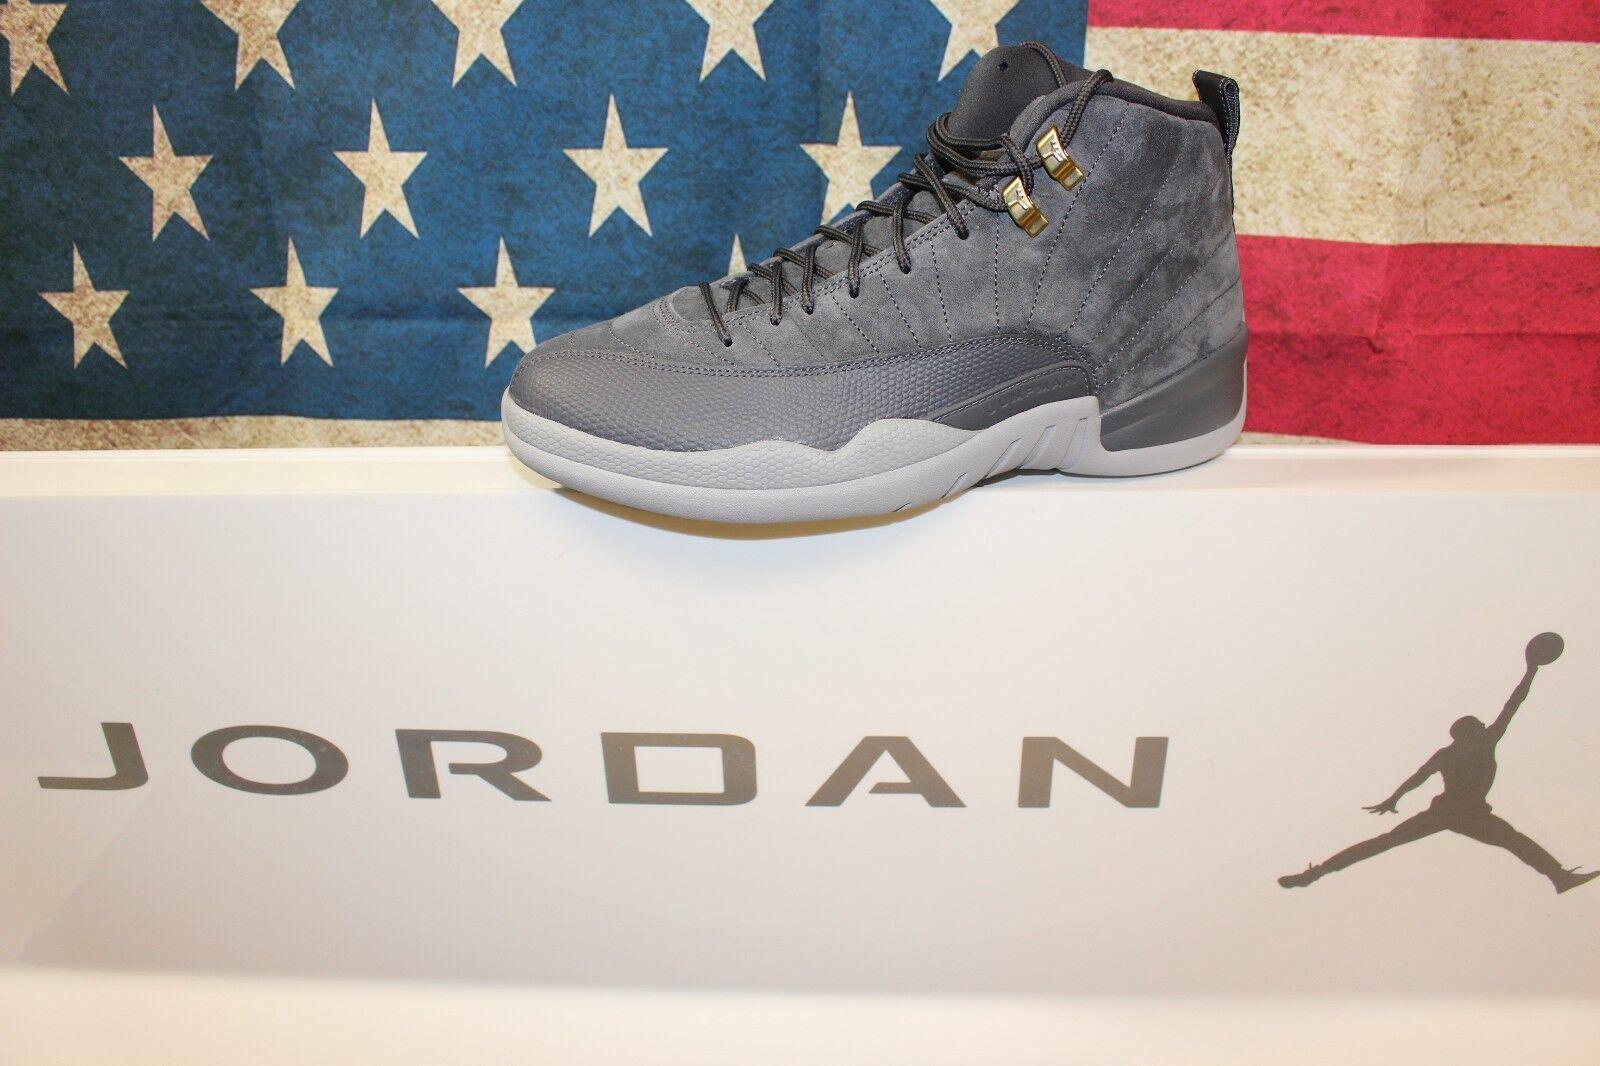 Nike Jordan Retro 12 Dark Grey 130690-005 Brand New DS Size 10